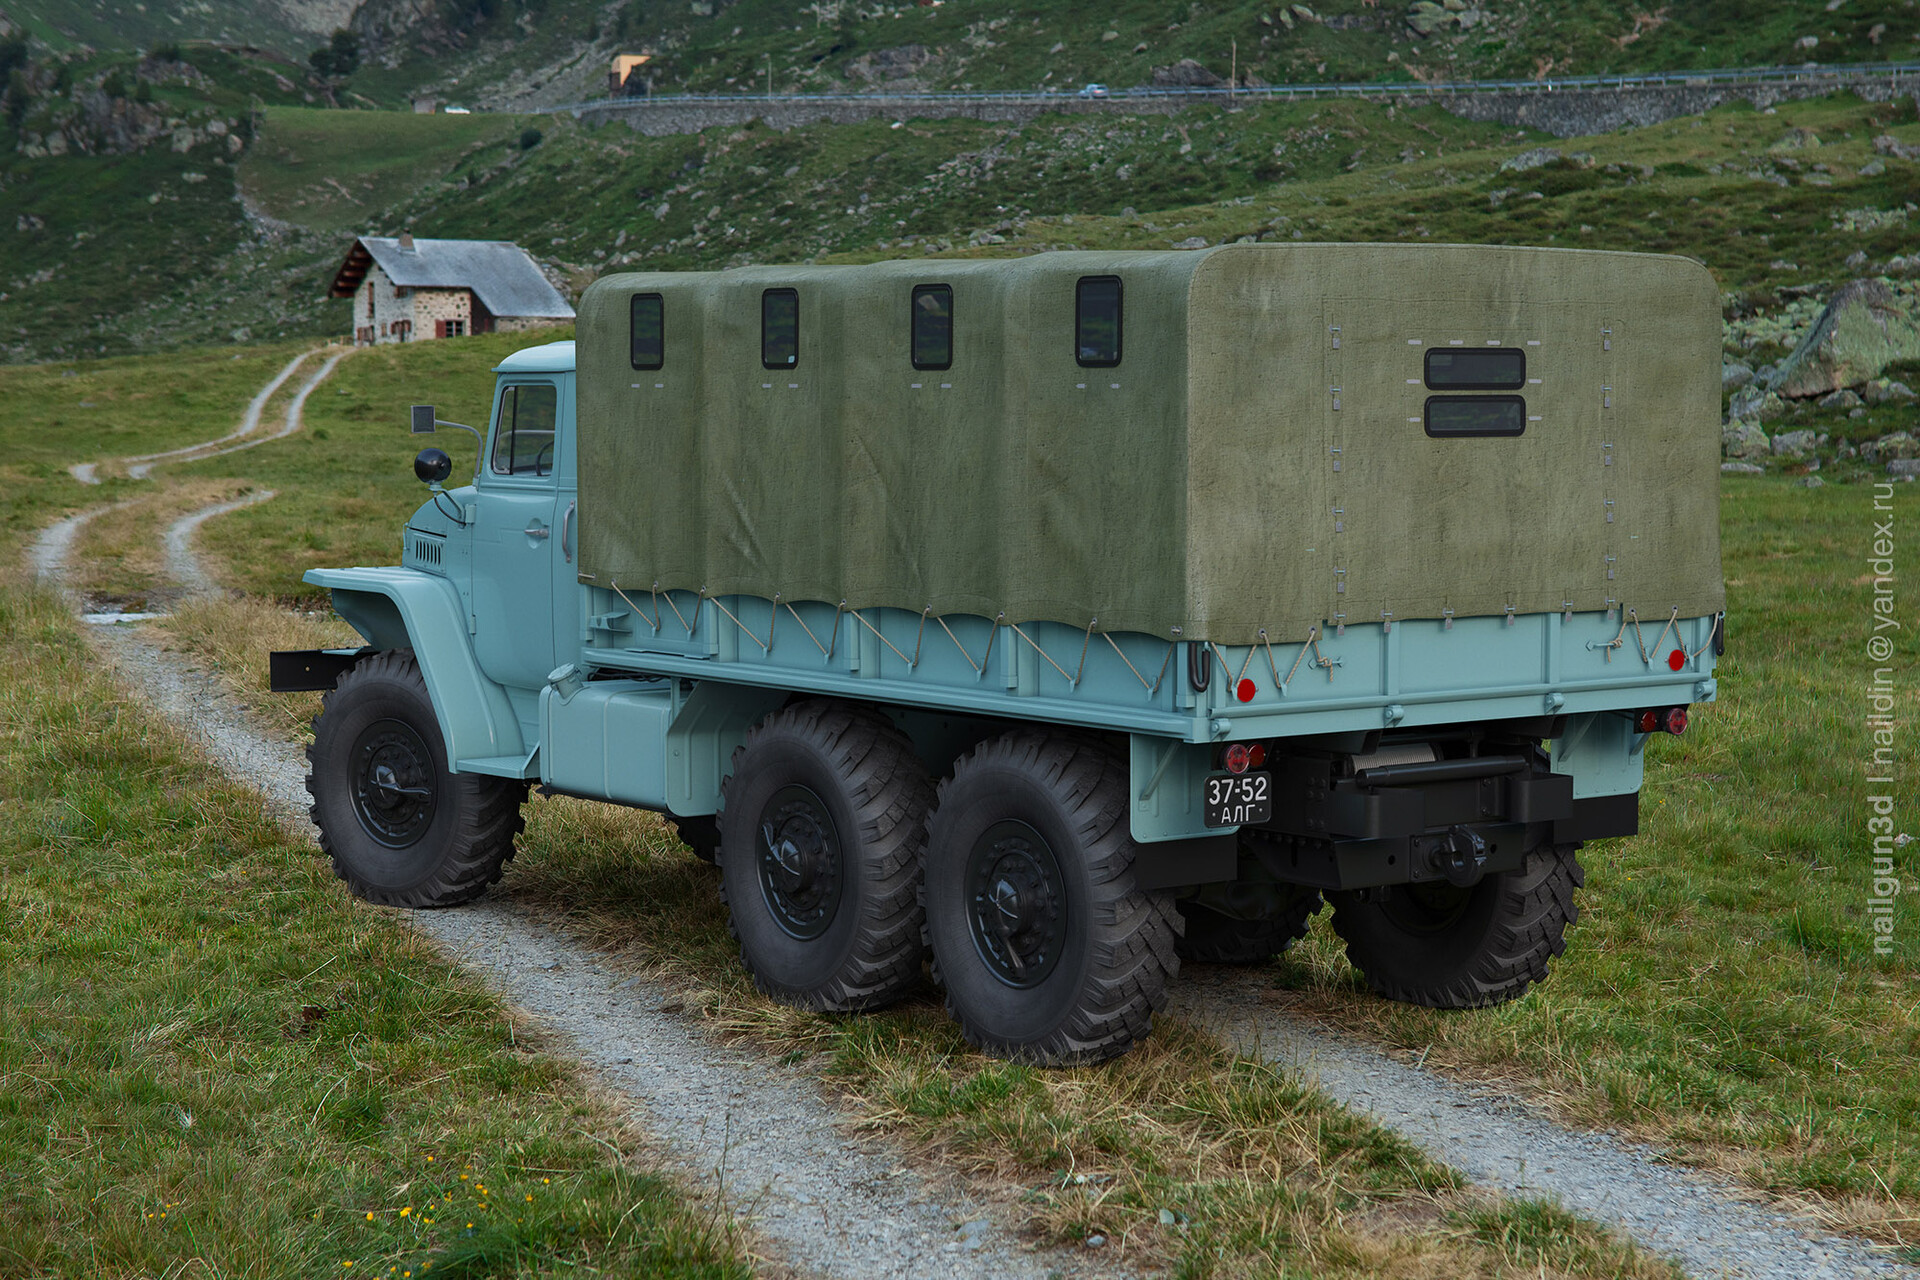 Nail khusnutdinov alg 043 010 ural 375d rear view 3x